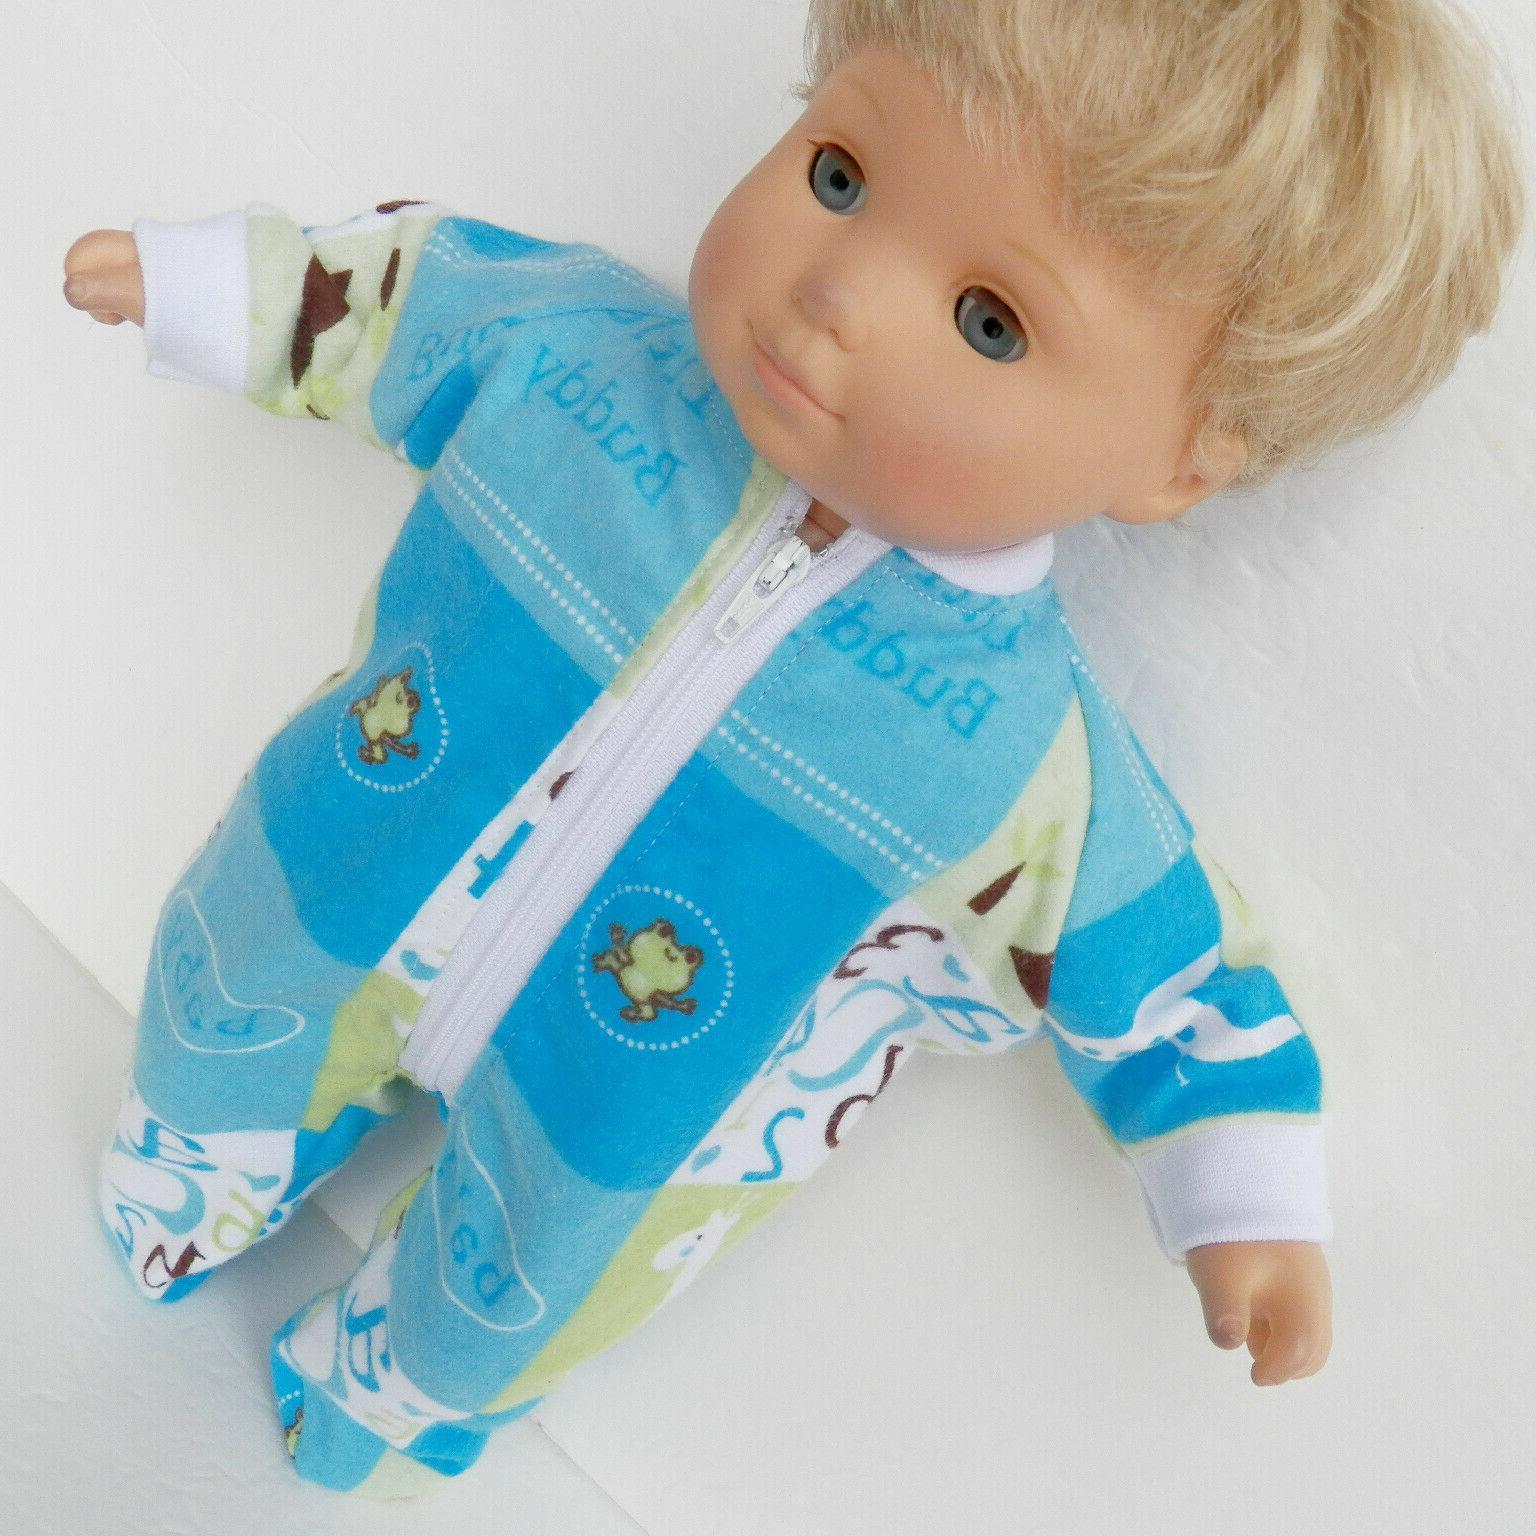 SALE! Baby DOLL CLOTHES, 15 INCH Boy,